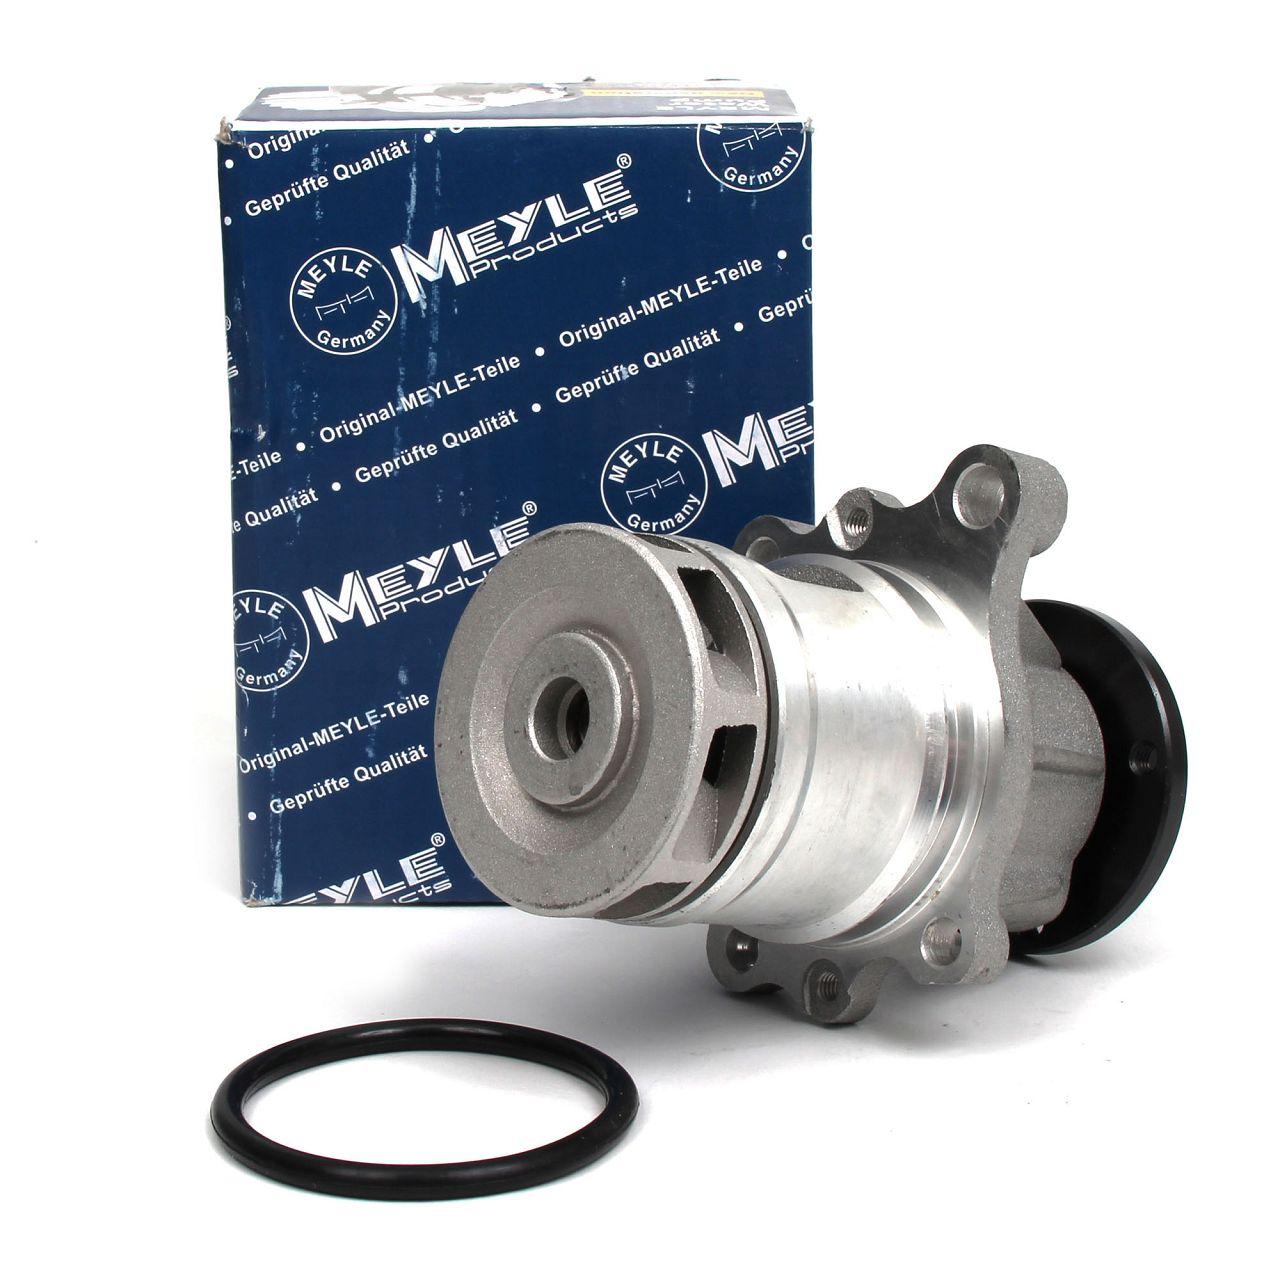 MEYLE Wasserpumpe BMW 3er E30 E36 E46 316i 318i 5er E34 518i Z3 E36 1.8i 1.9i